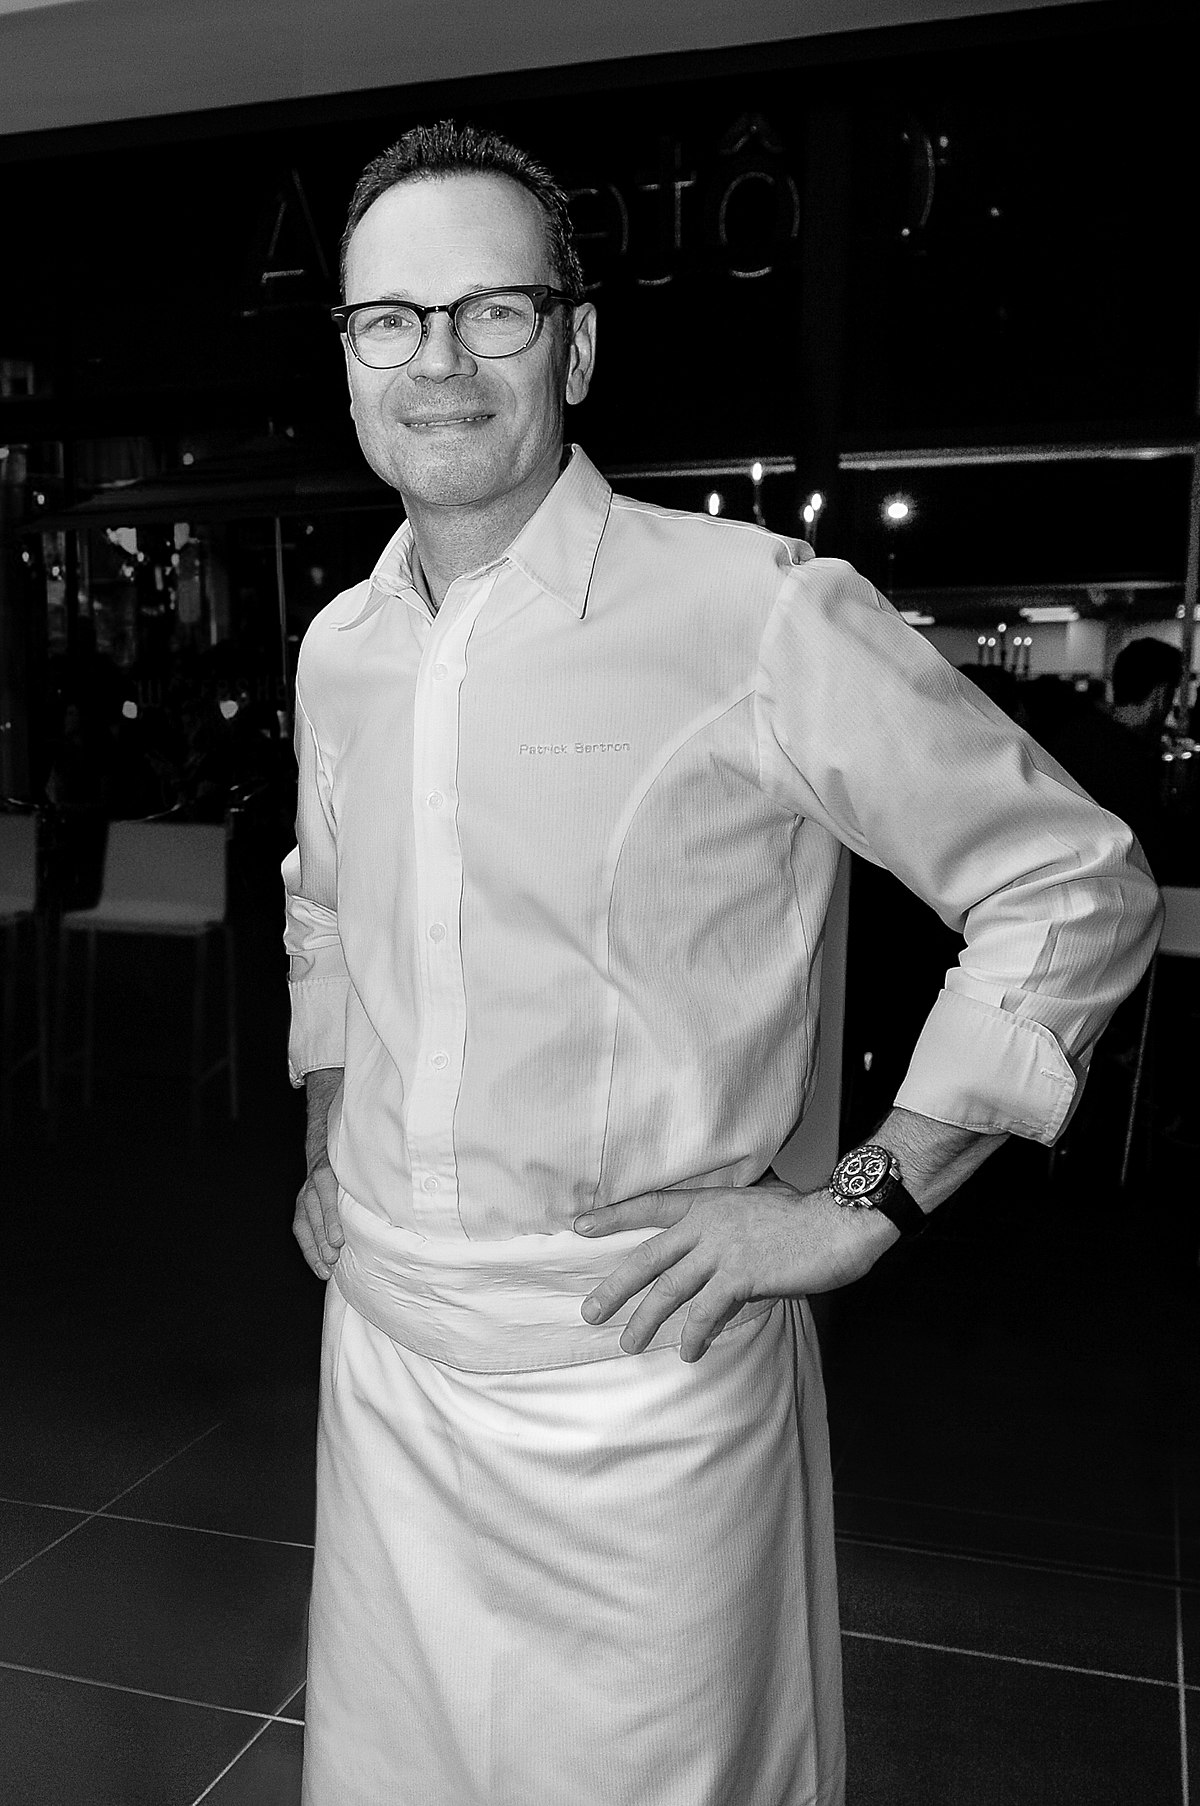 Patrick bertron wikip dia for Cuisinier loiseau